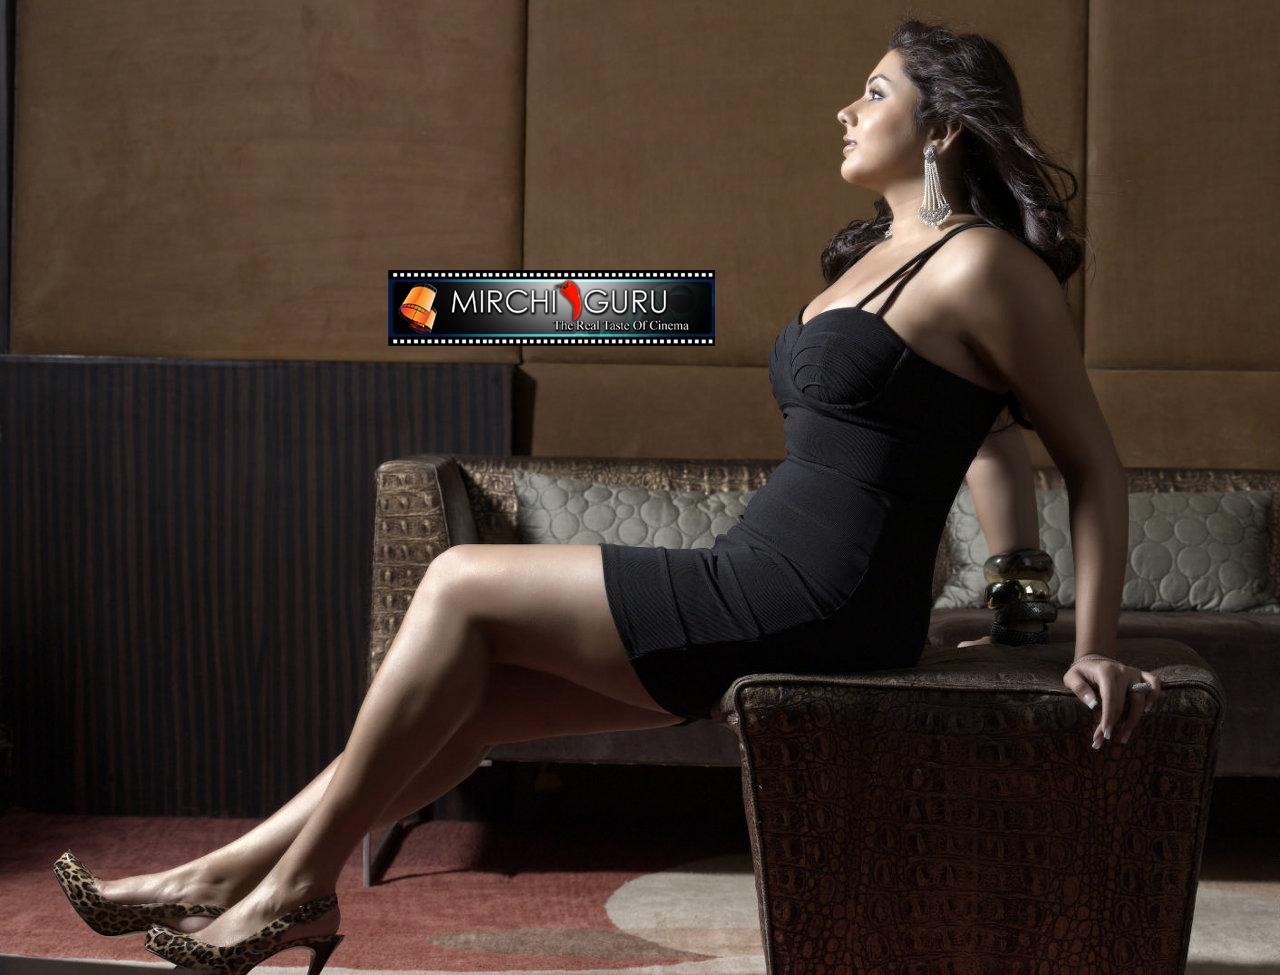 http://3.bp.blogspot.com/_jdnlGz1uv74/TKAvAqHkU5I/AAAAAAAAACw/rcOJ9C21fKE/s1600/namitha_photo_shoot_wallpapers_08+copy.jpg